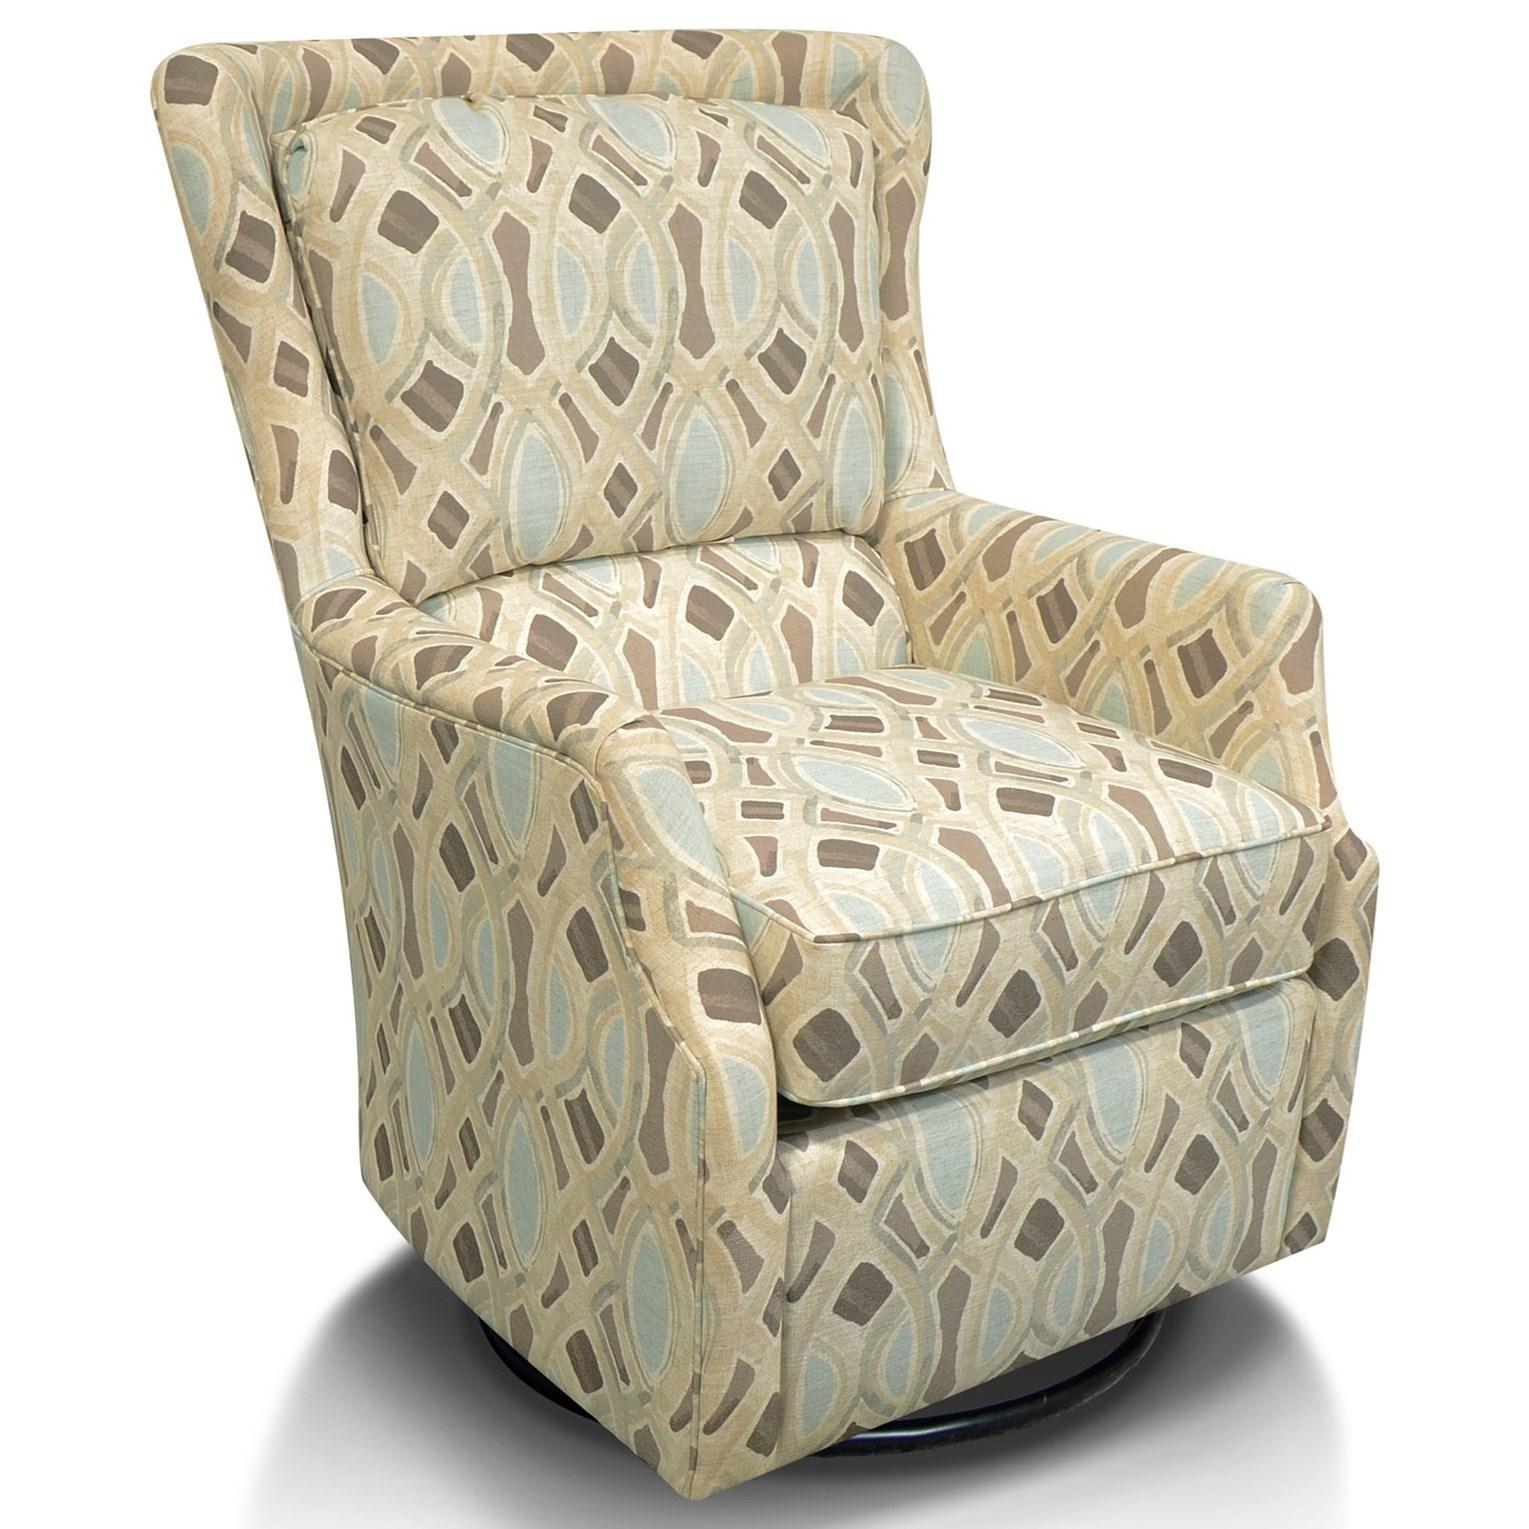 England Loren Swivel Chair Godby Home Furnishings